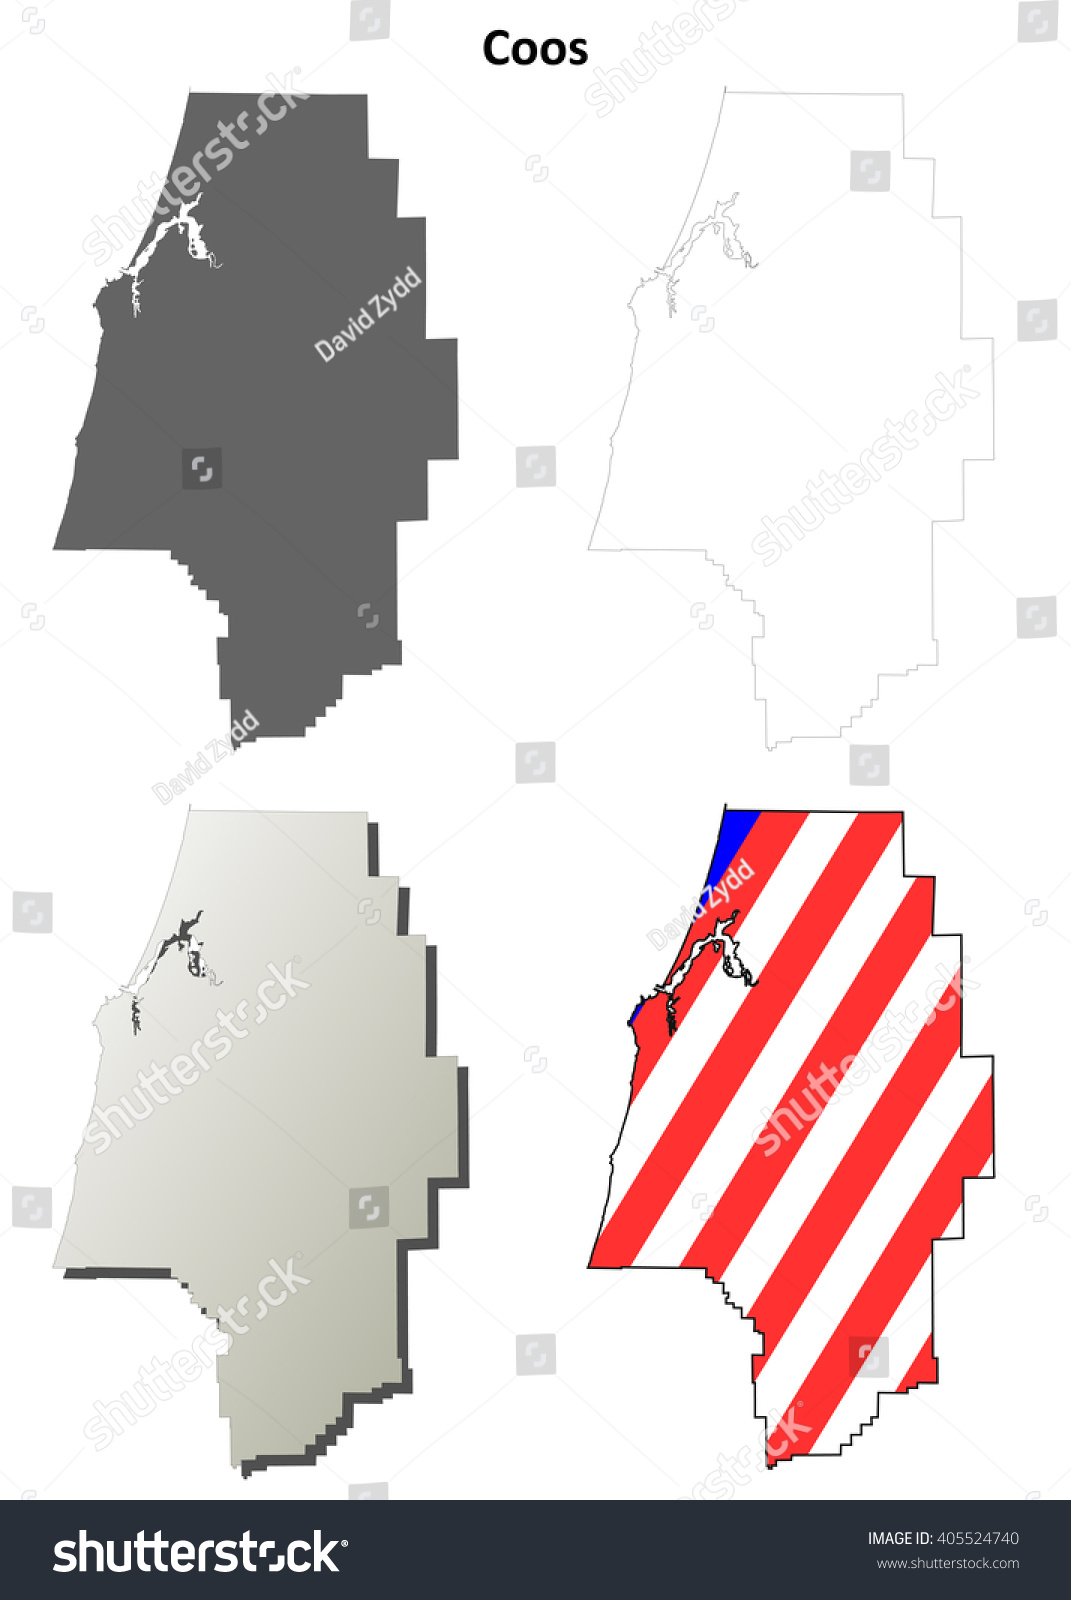 Coos County Oregon Blank Outline Map Set Stock Vector Illustration Shutterstock